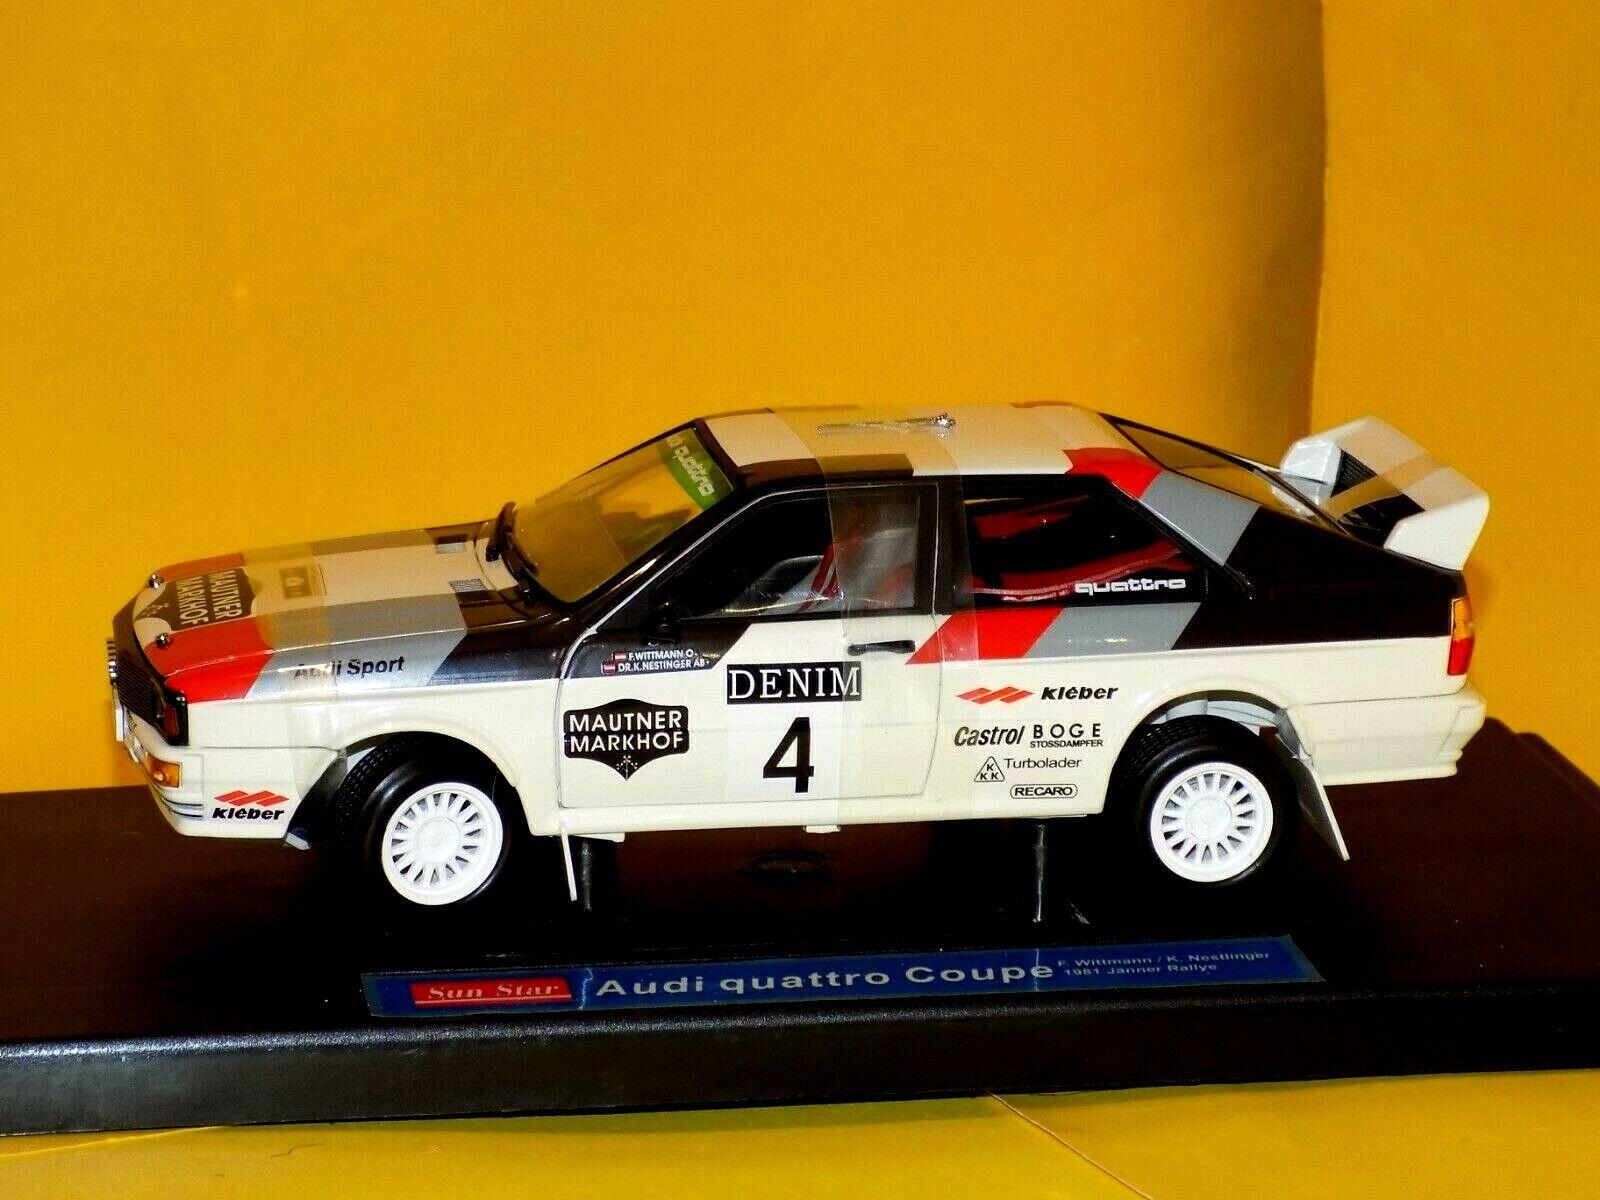 Audi Quattro Coupe Coupe Coupe for Wittmann K.Nestlinger  DENIM 1981  SUN STAR 4182 1 18 15d73d